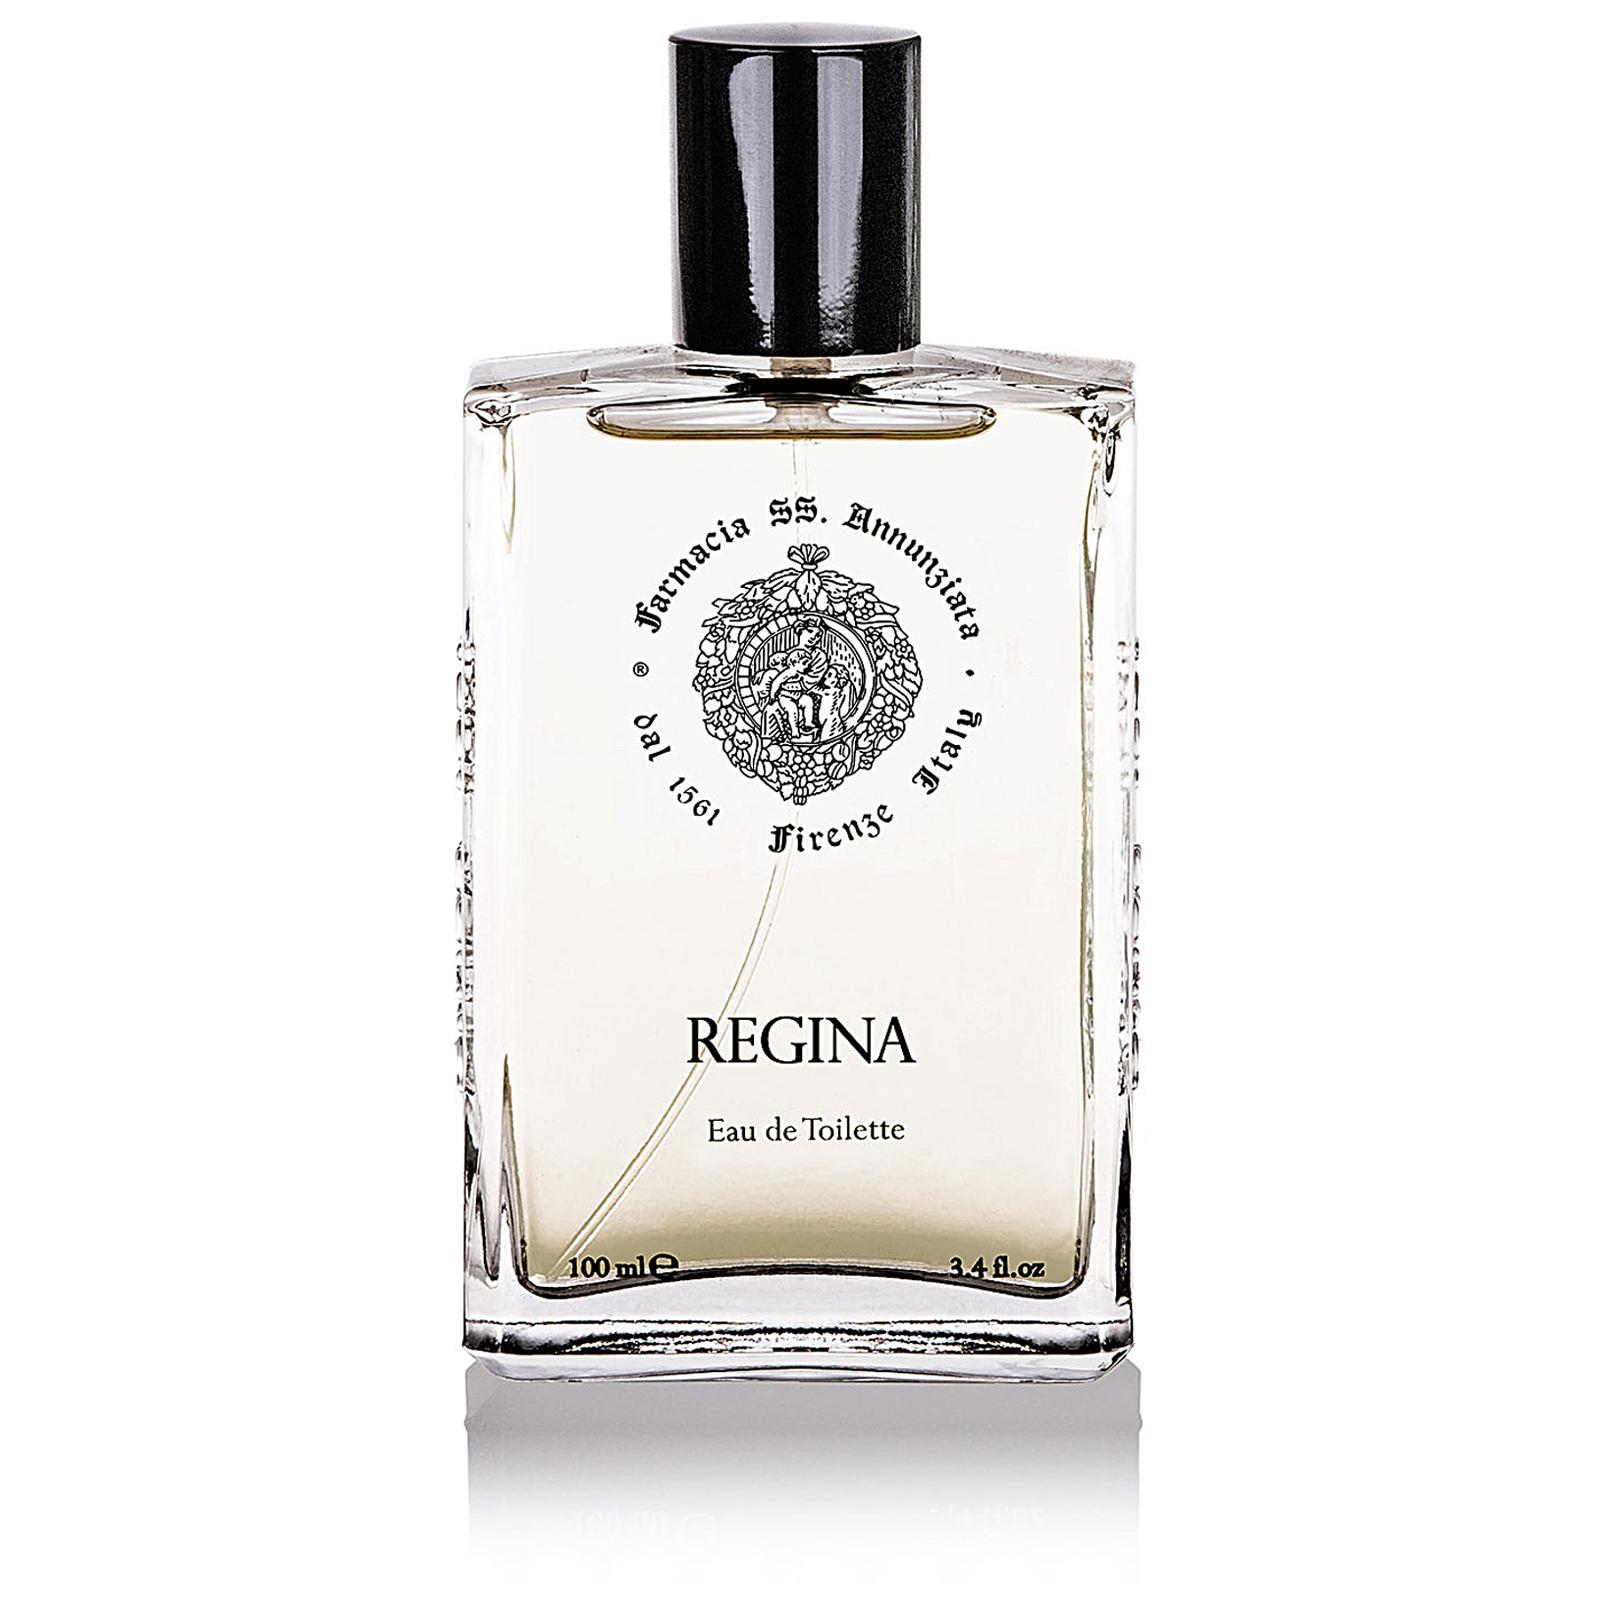 Regina profumo eau de toilette 100 ml